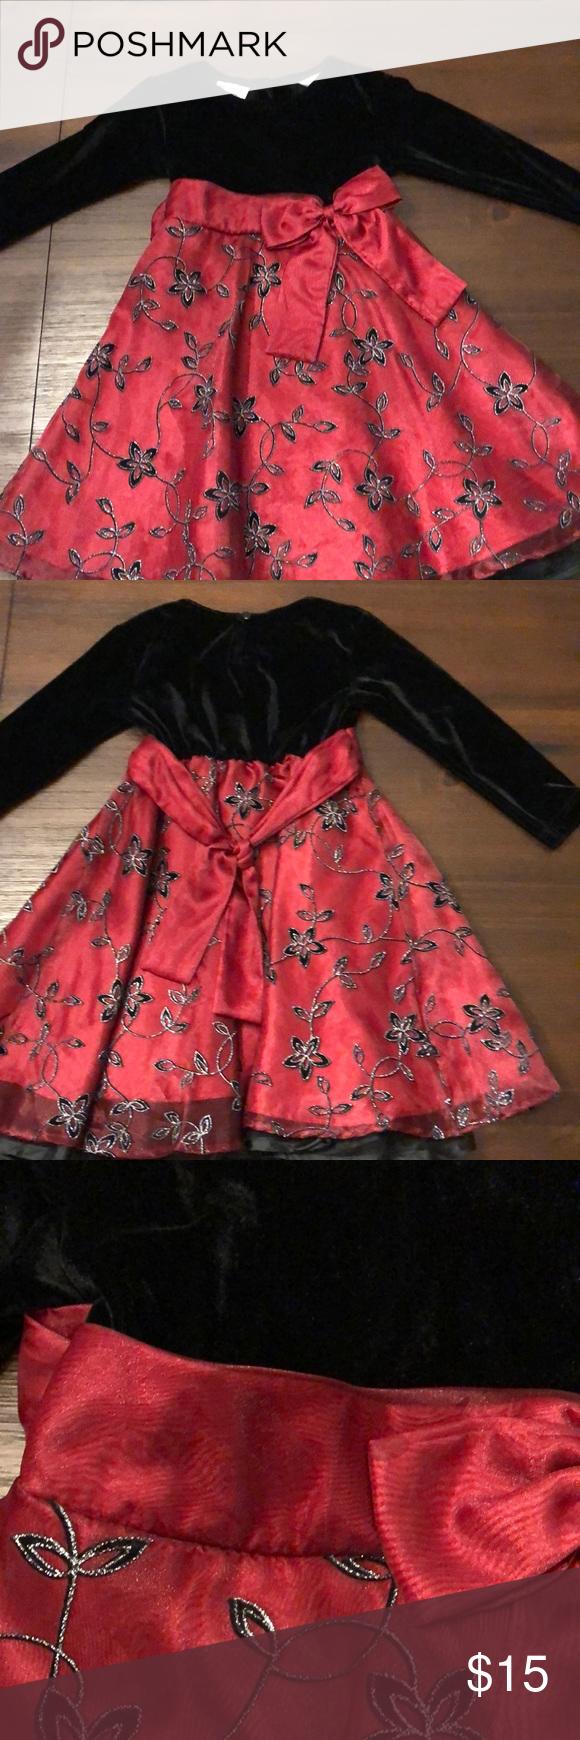 Girls Dress 3t 3t Dress Girls Dresses Dresses [ 1740 x 580 Pixel ]